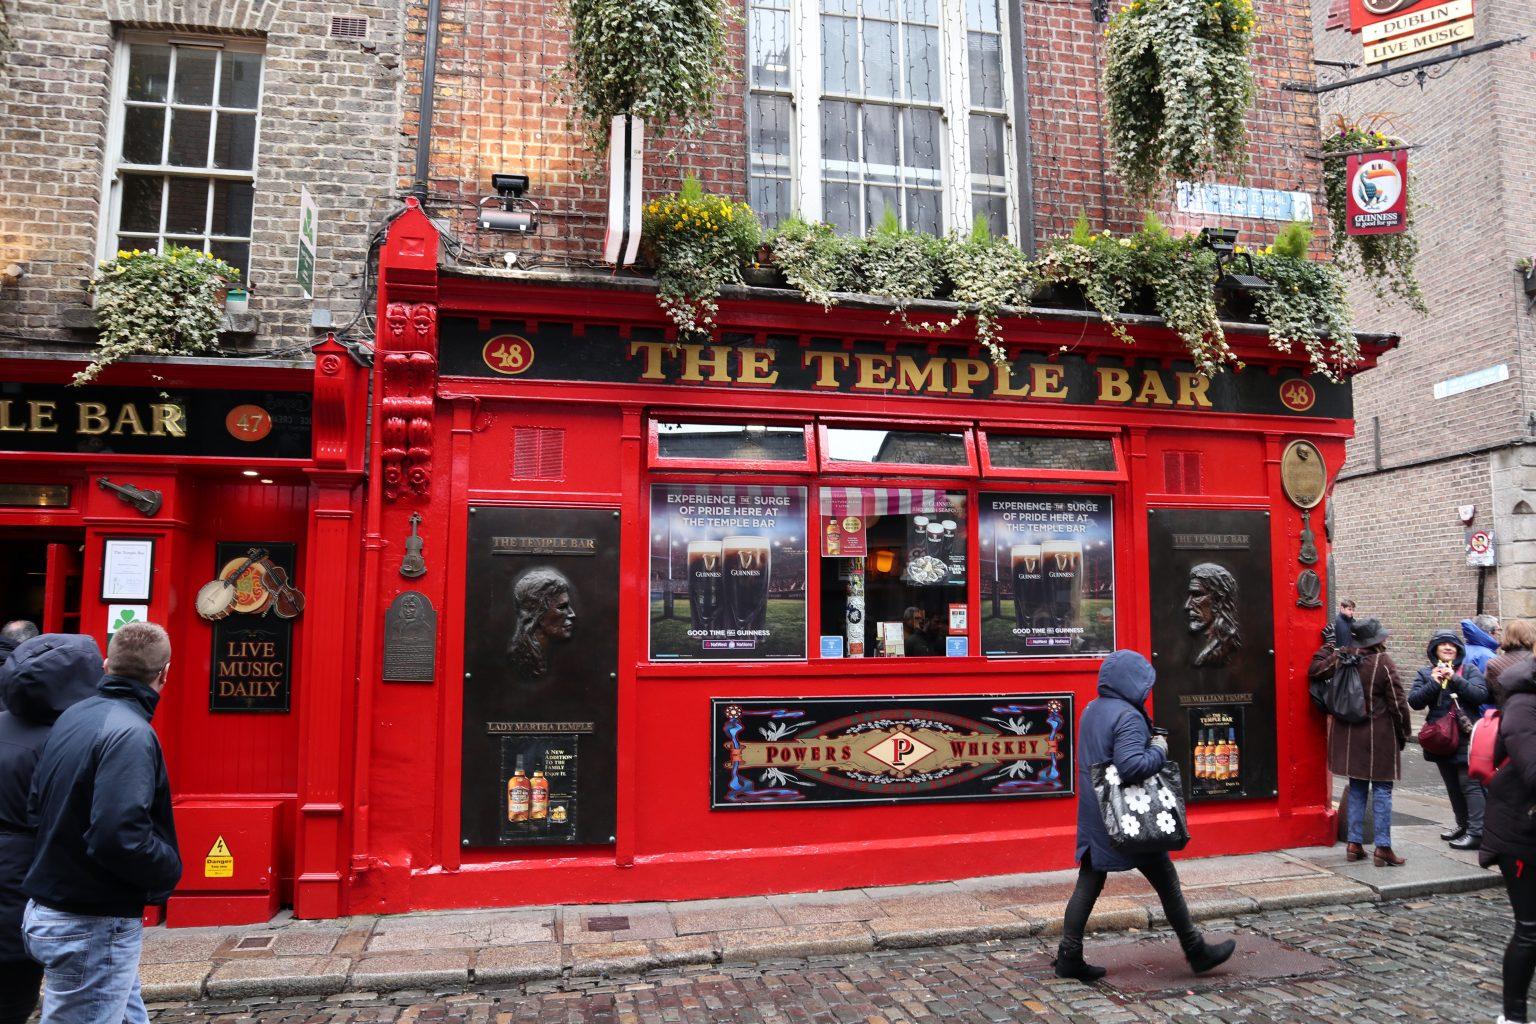 The Temple Bar. qué ver en Dublín